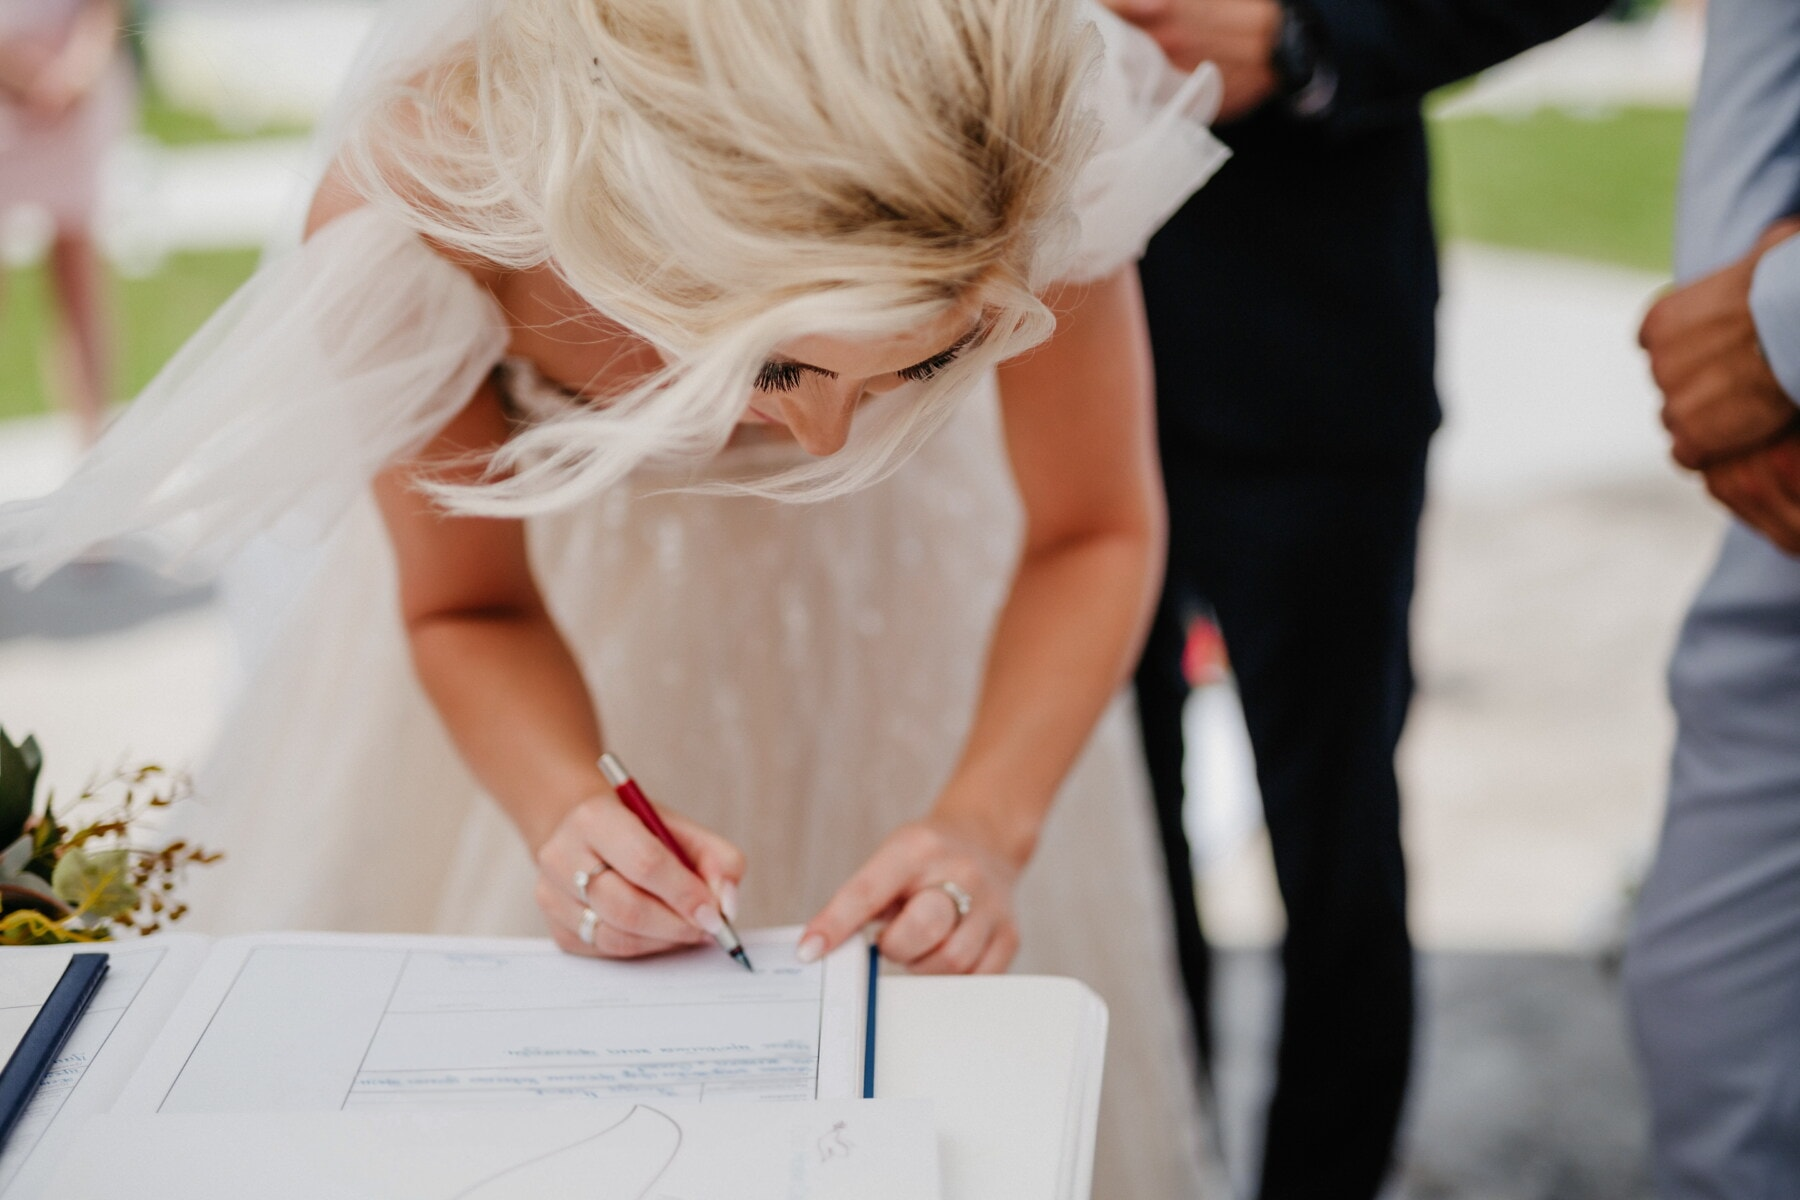 la mariée, signe, mariage, signature, crayon, livre, femme, amour, joli, romance